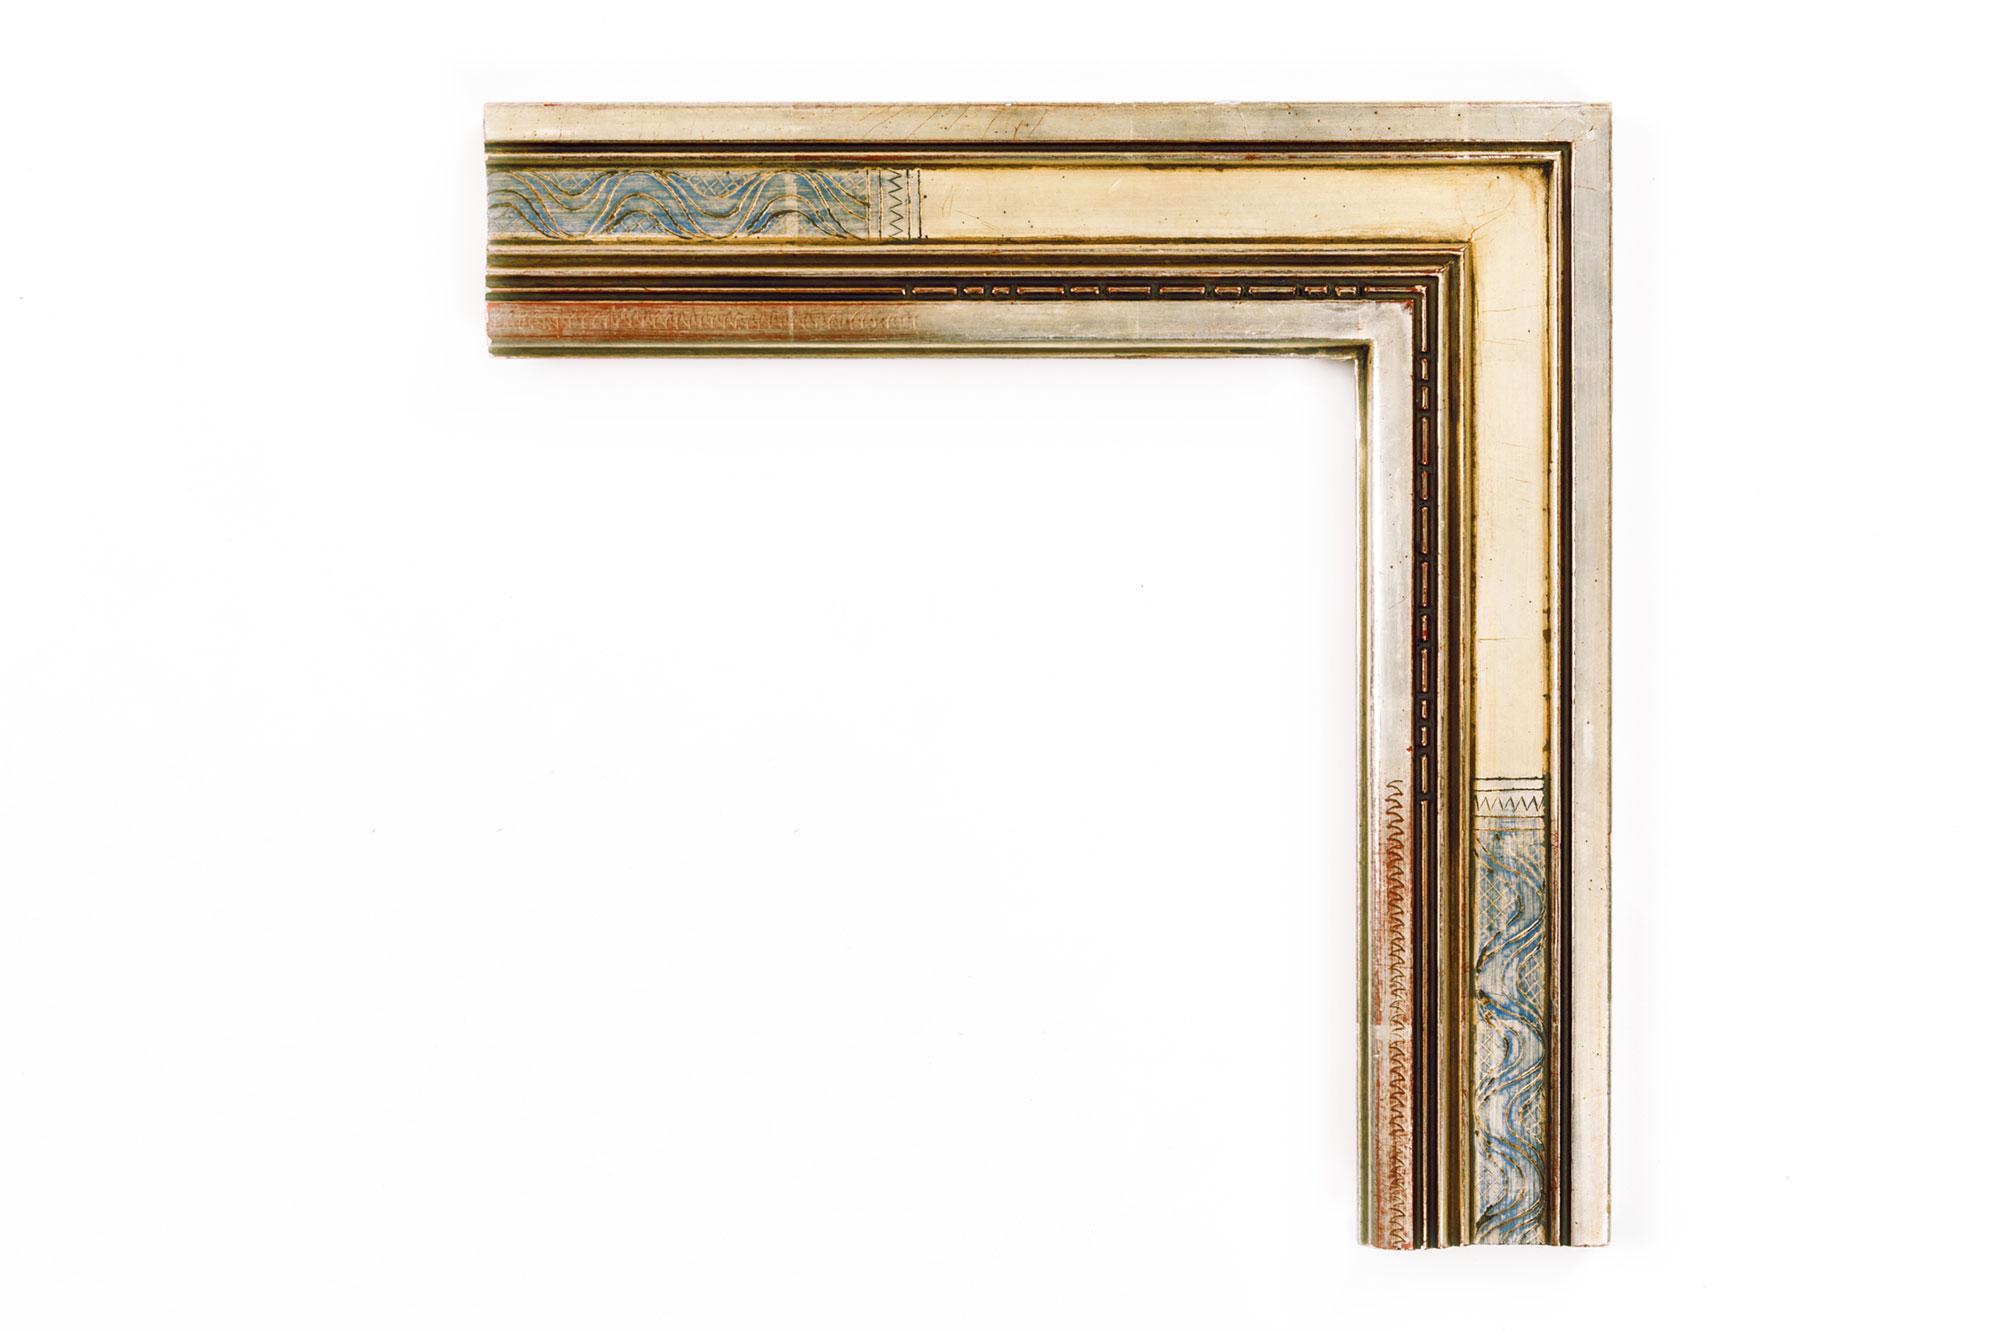 "Bernard Badura White Gold  2 3/4"" Badura-inspired Warm White Gold, Blue Engraved Design in Panel"